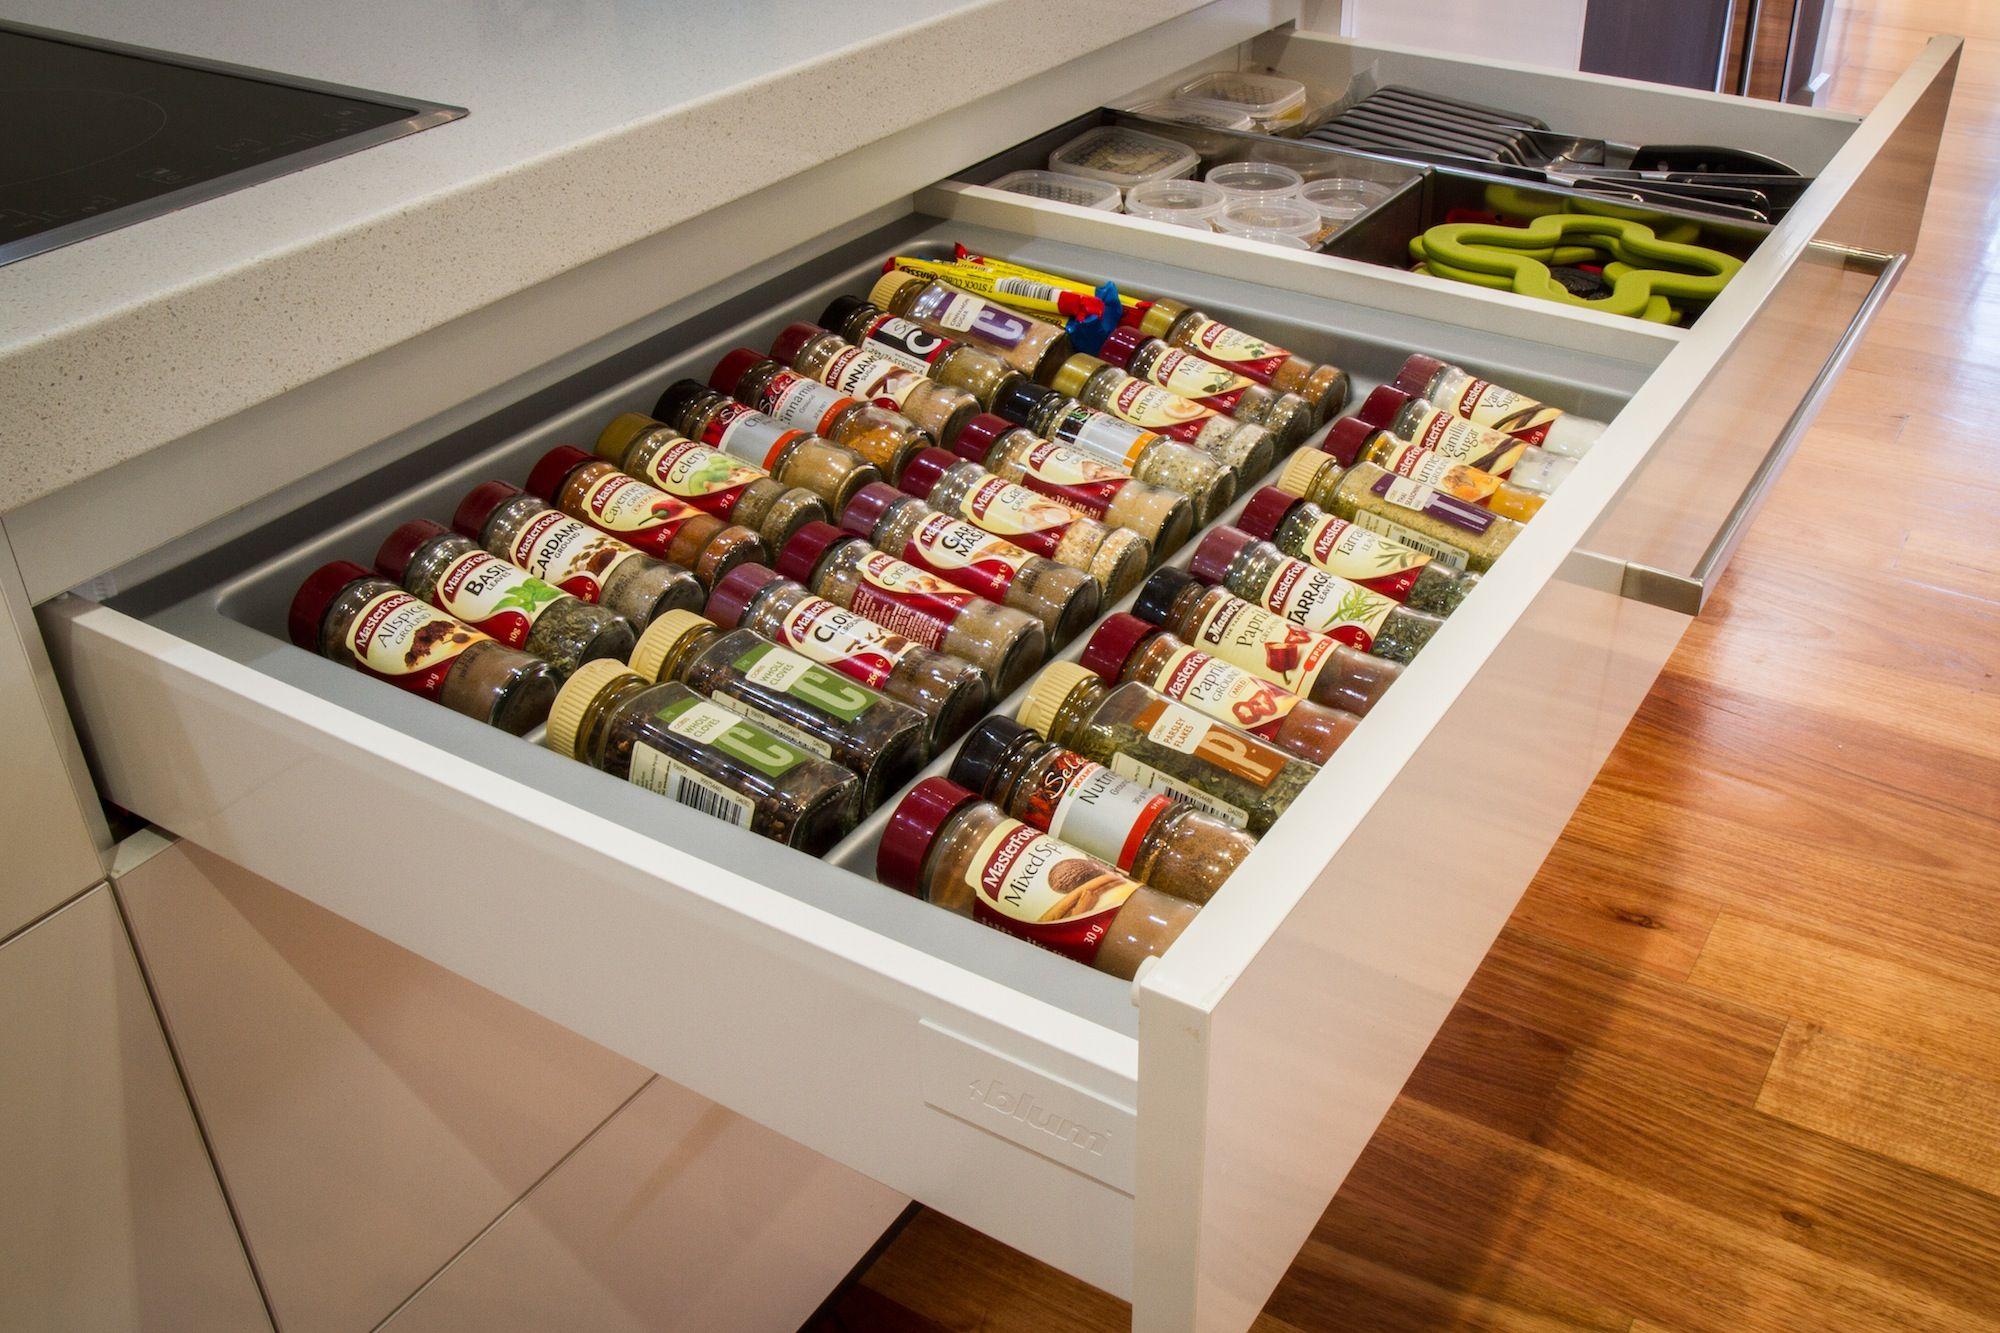 Kitchen drawer inserts for spices - Spice Drawer Blum Drawer Www Thekitchendesigncentre Com Au